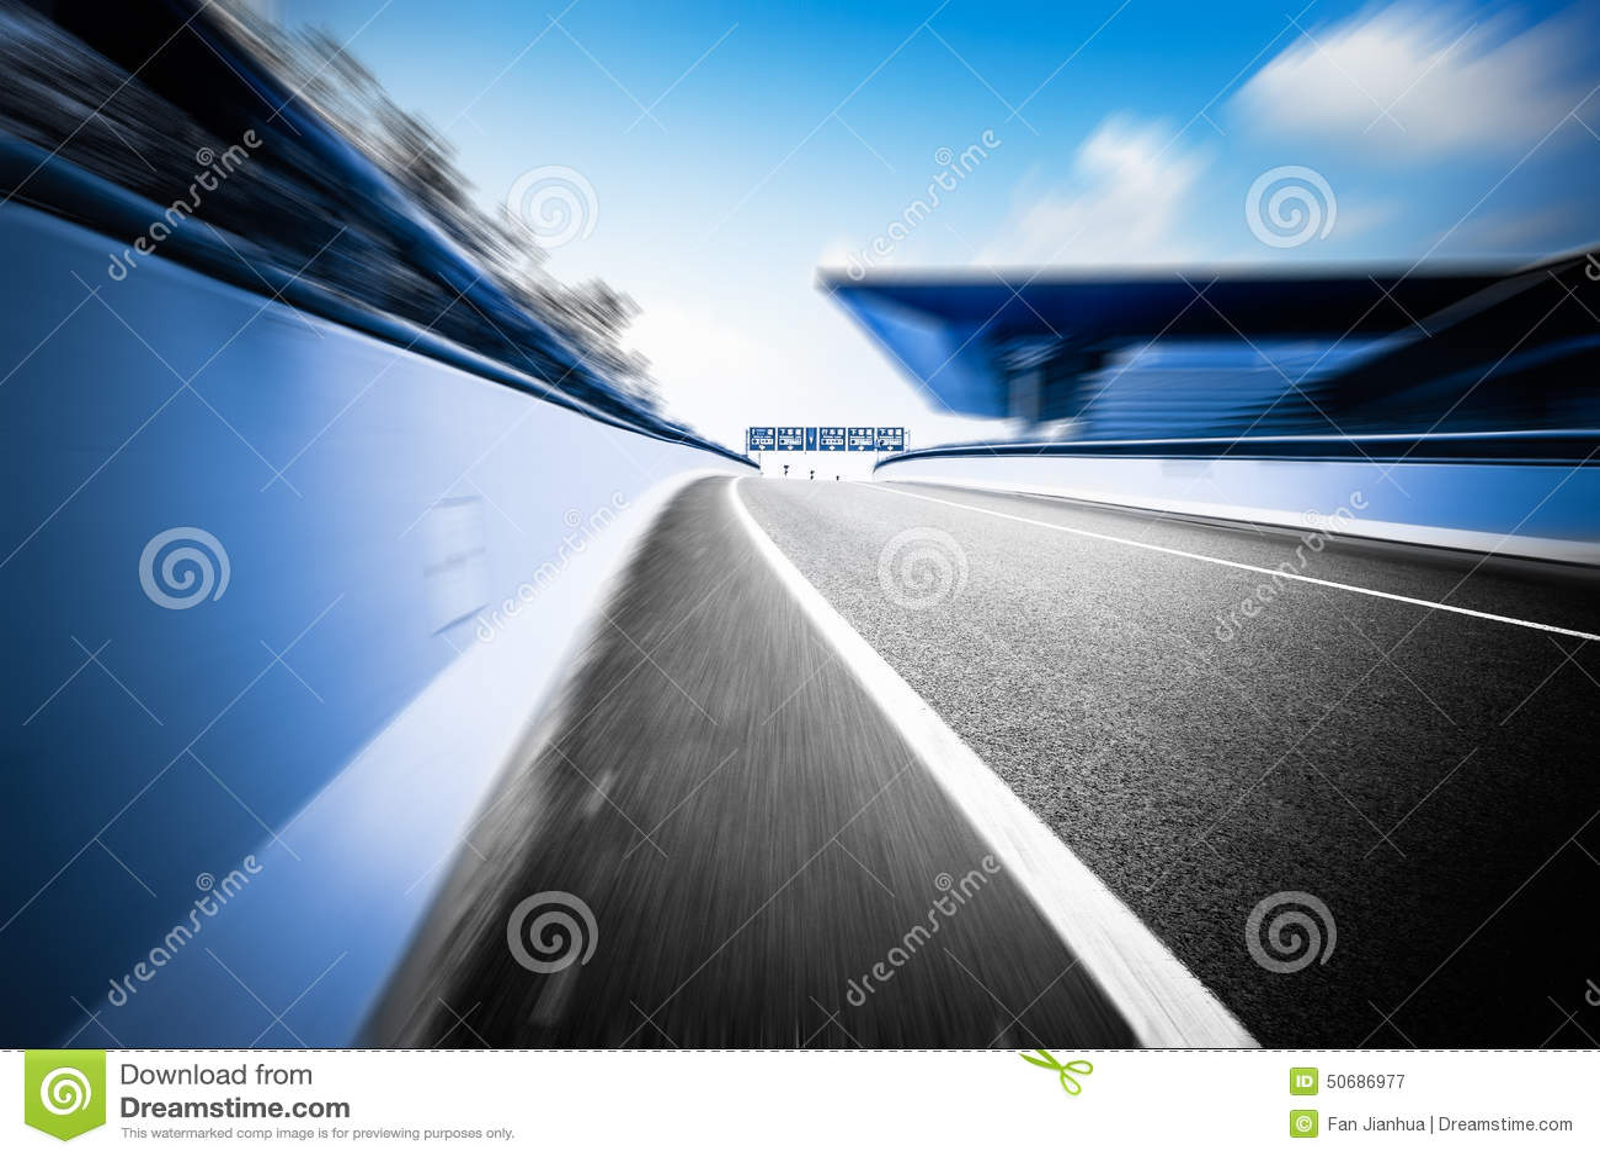 Download 现代建筑学背景和路 库存图片. 图片 包括有 现代, 堵塞, 标号, 繁忙, 运输, 旅行, 模糊, 室外 - 50686977